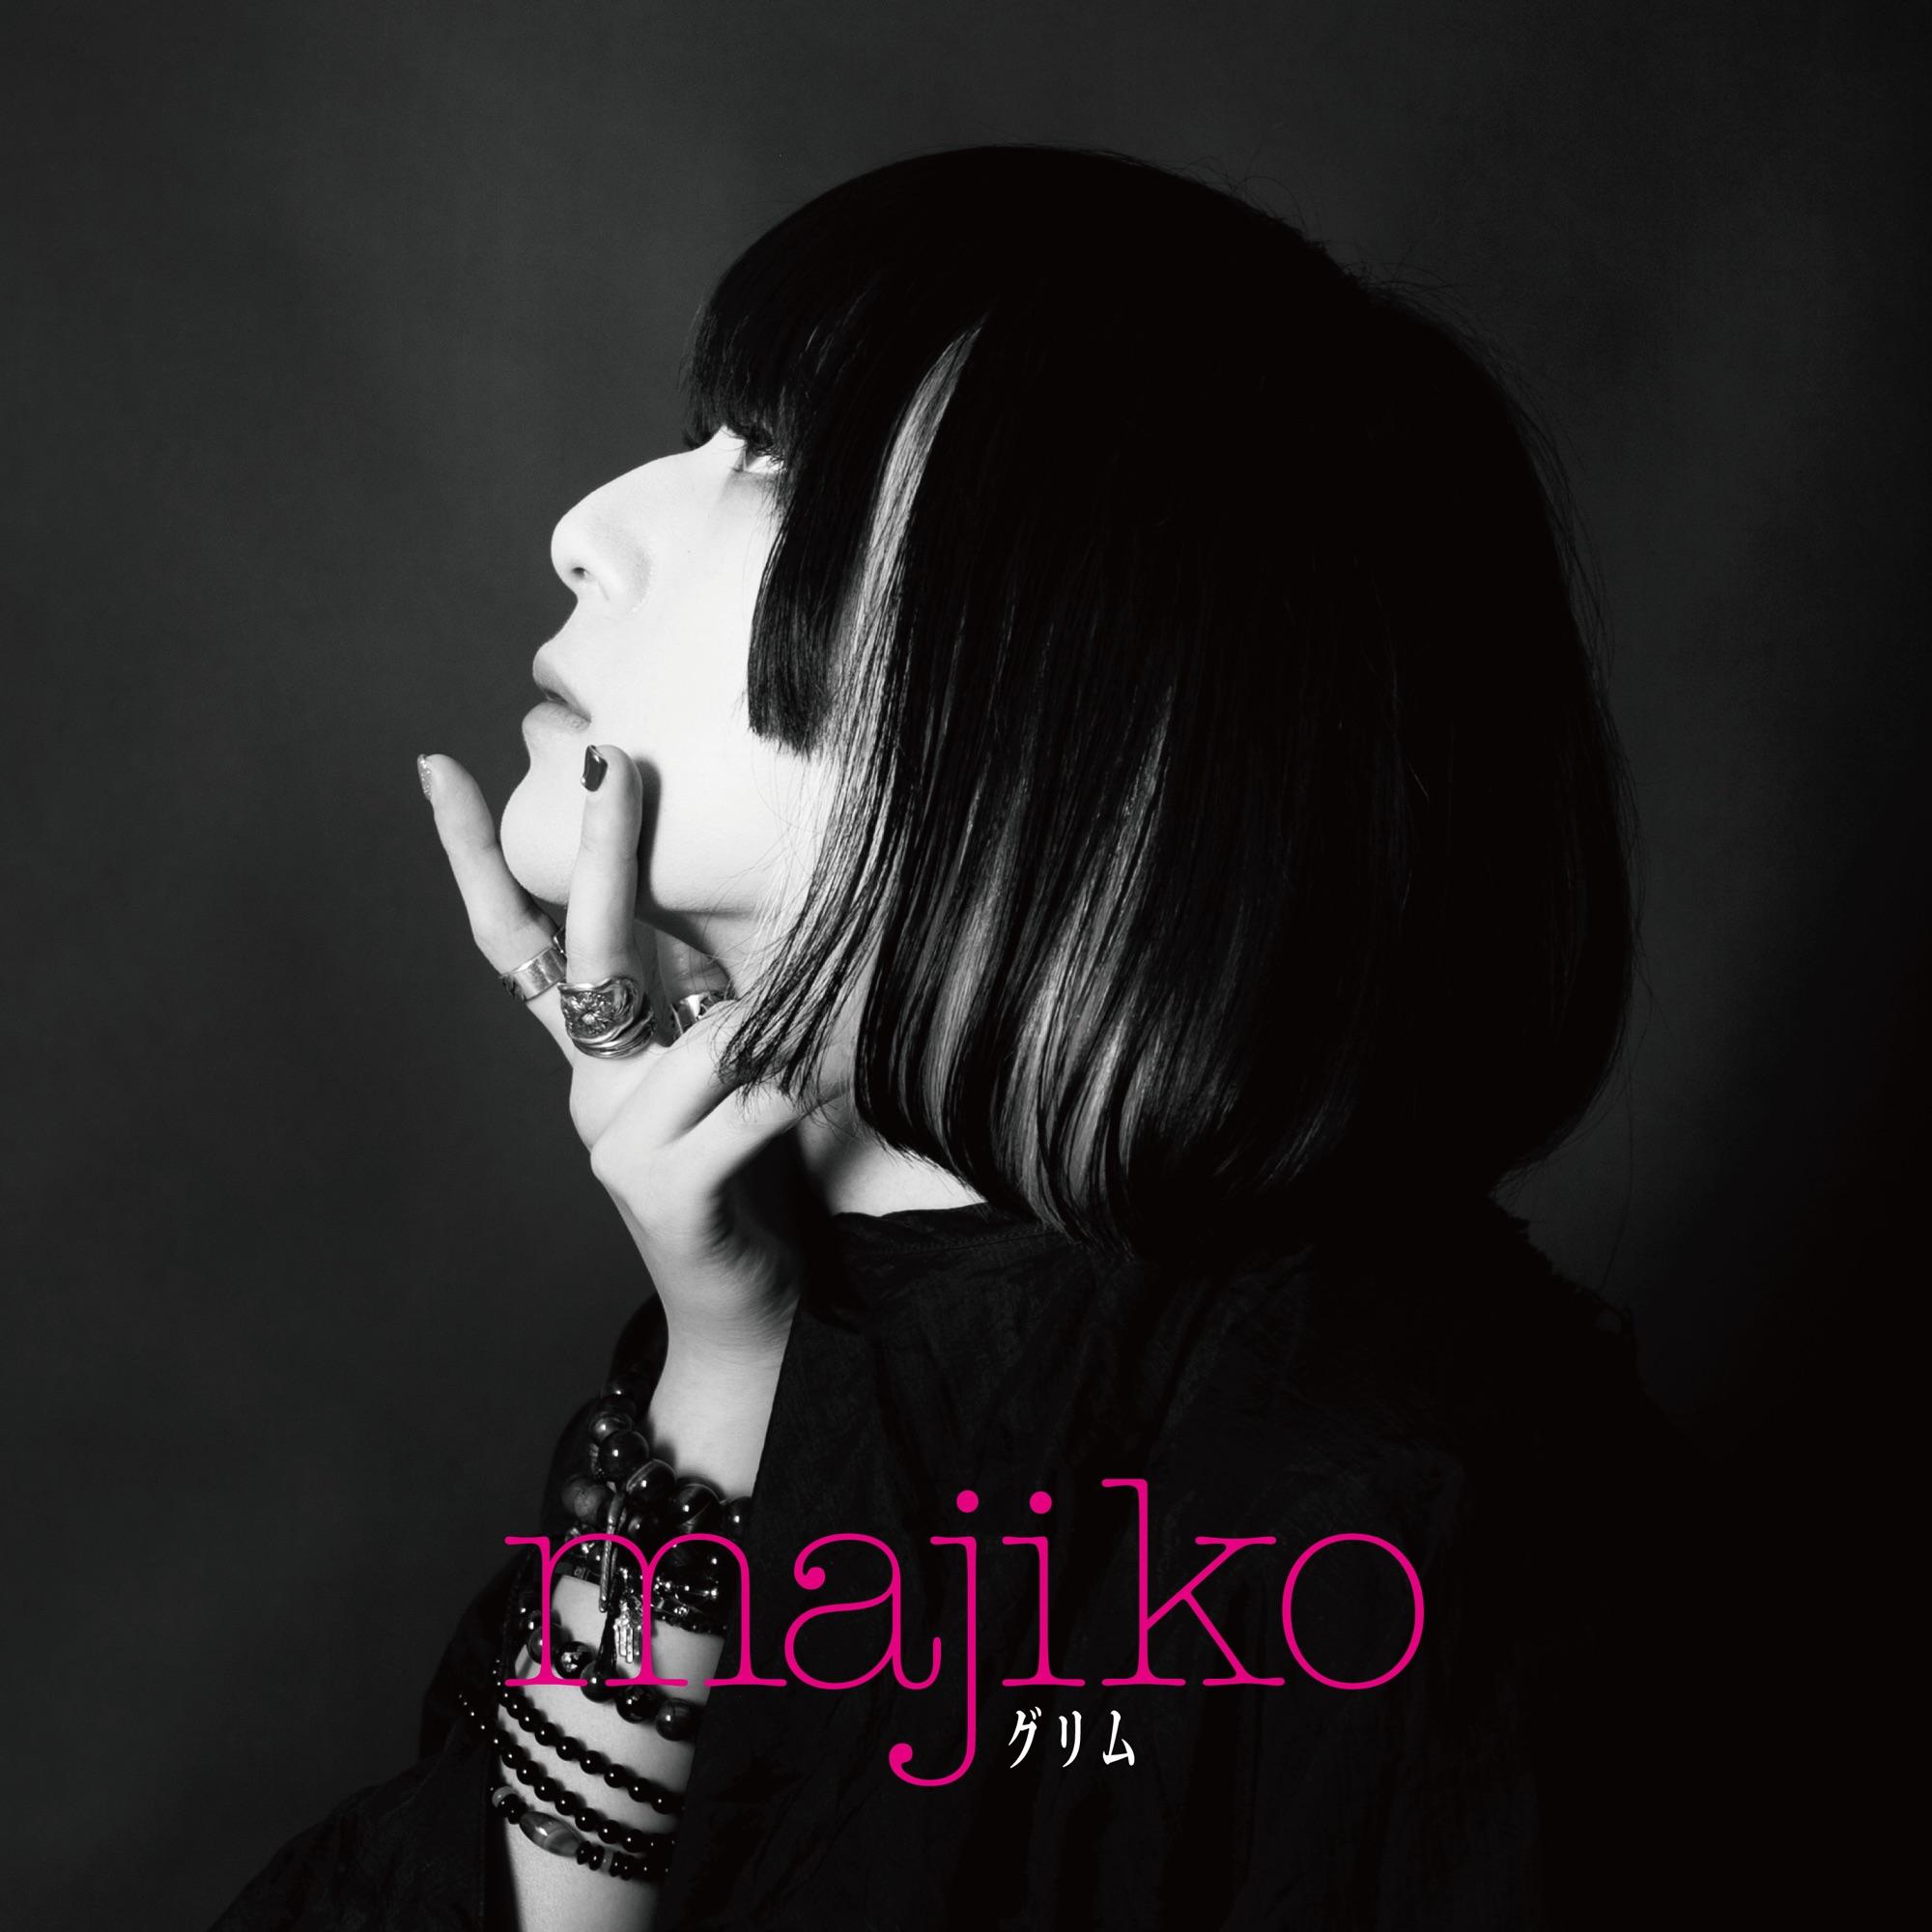 Majiko - Grimm グリム